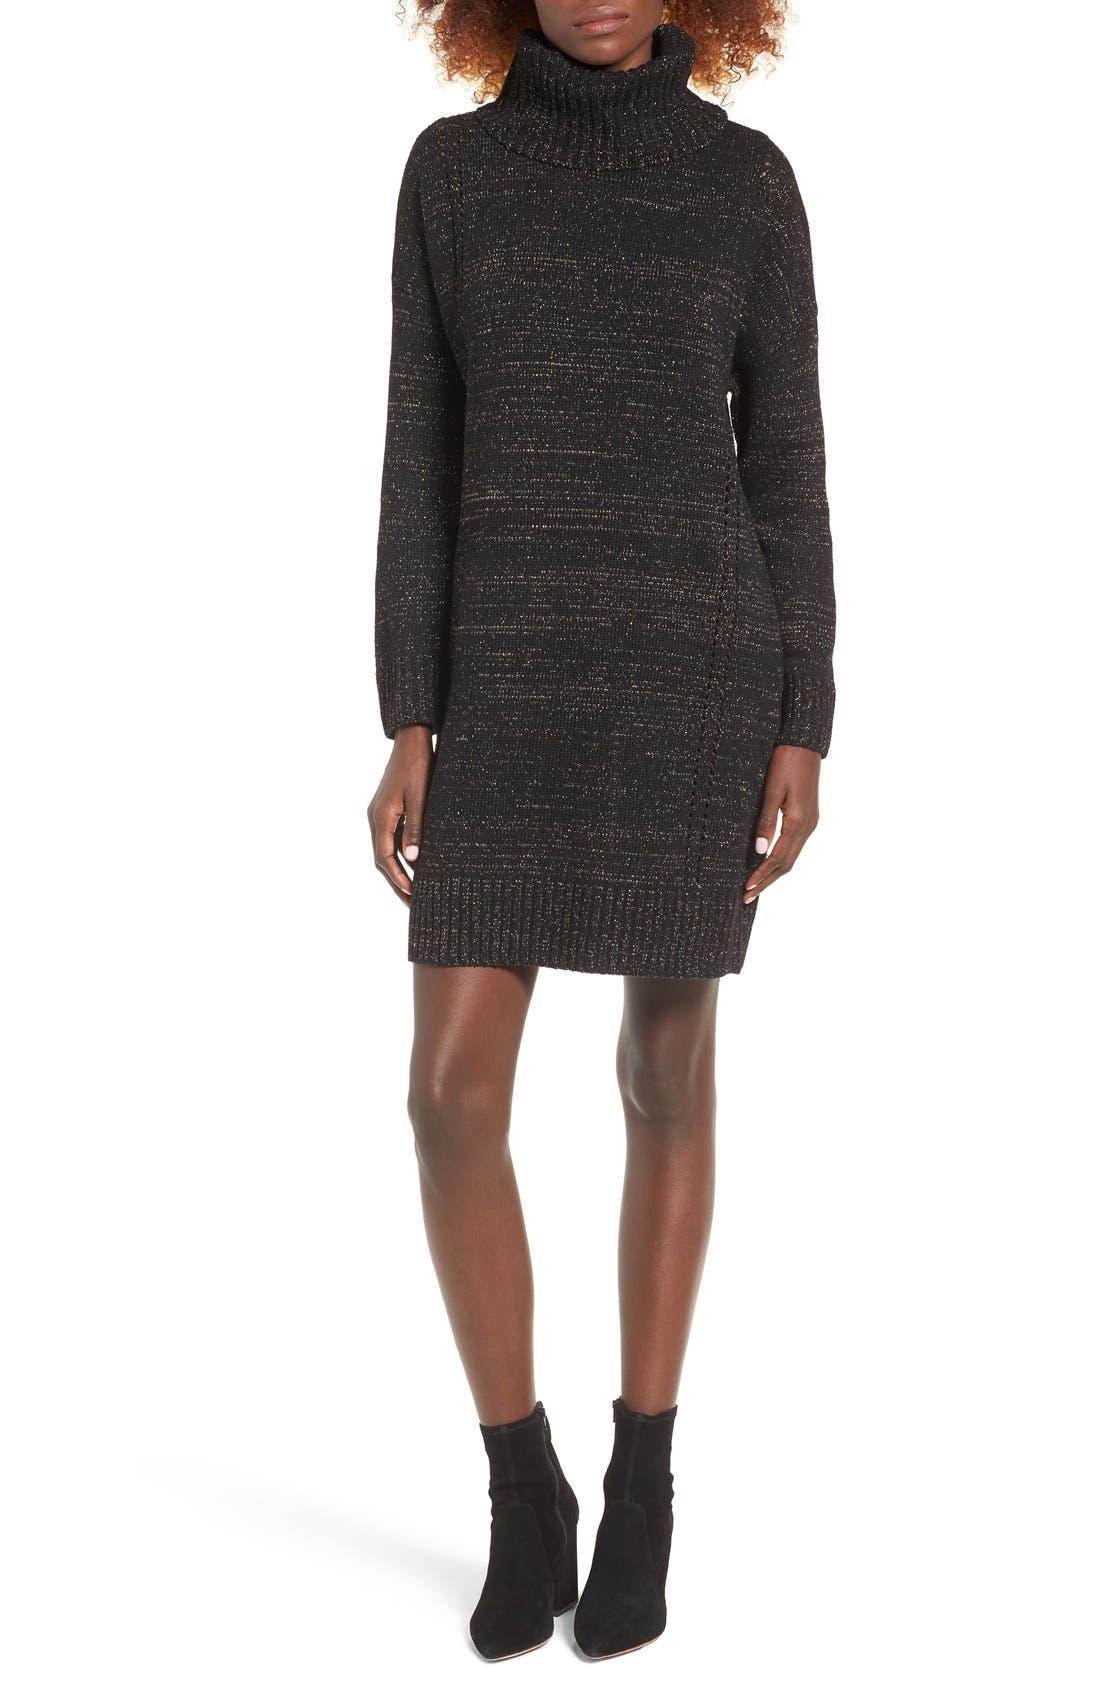 Alternate Image 1 Selected - MOON RIVER Turtleneck Sweater Dress